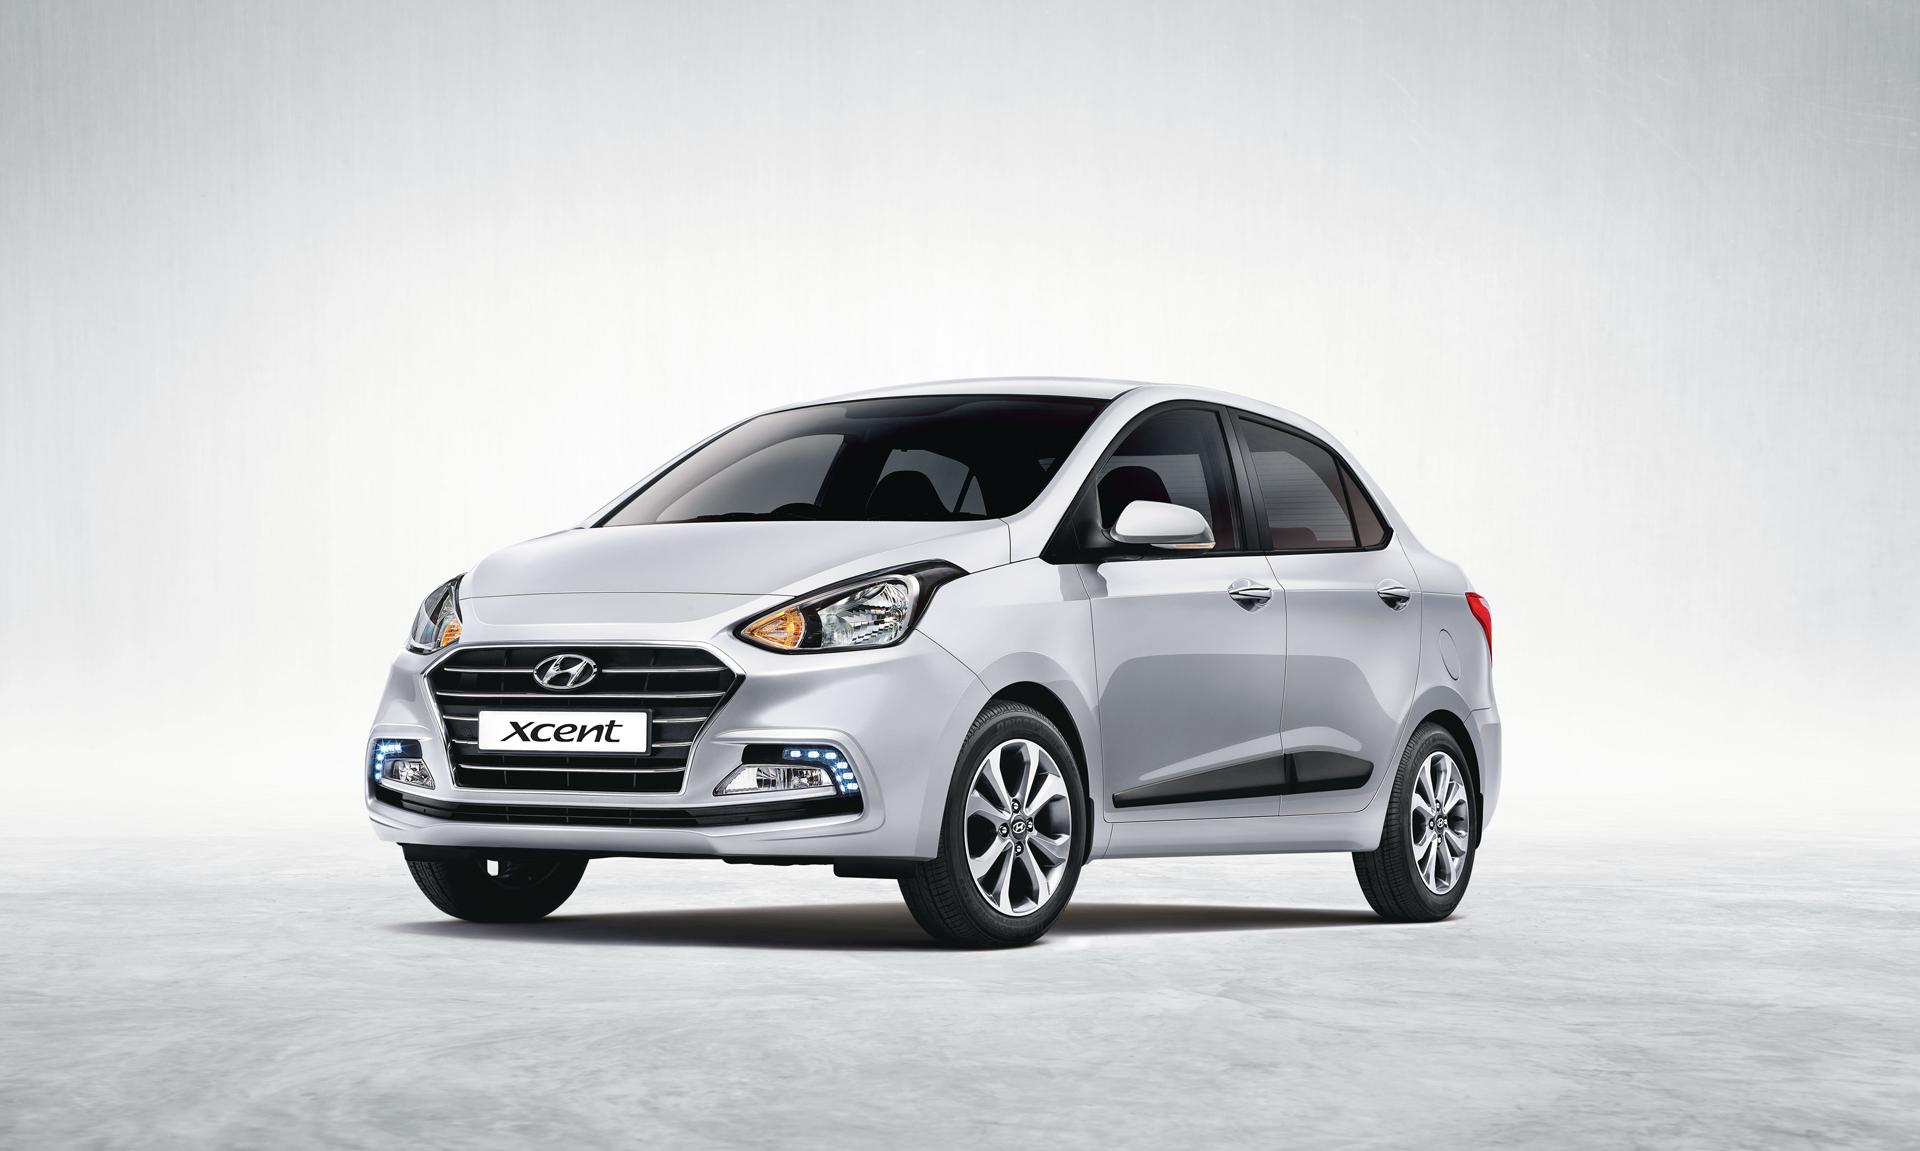 Hyundai Xcent 2017 E CRDi Image